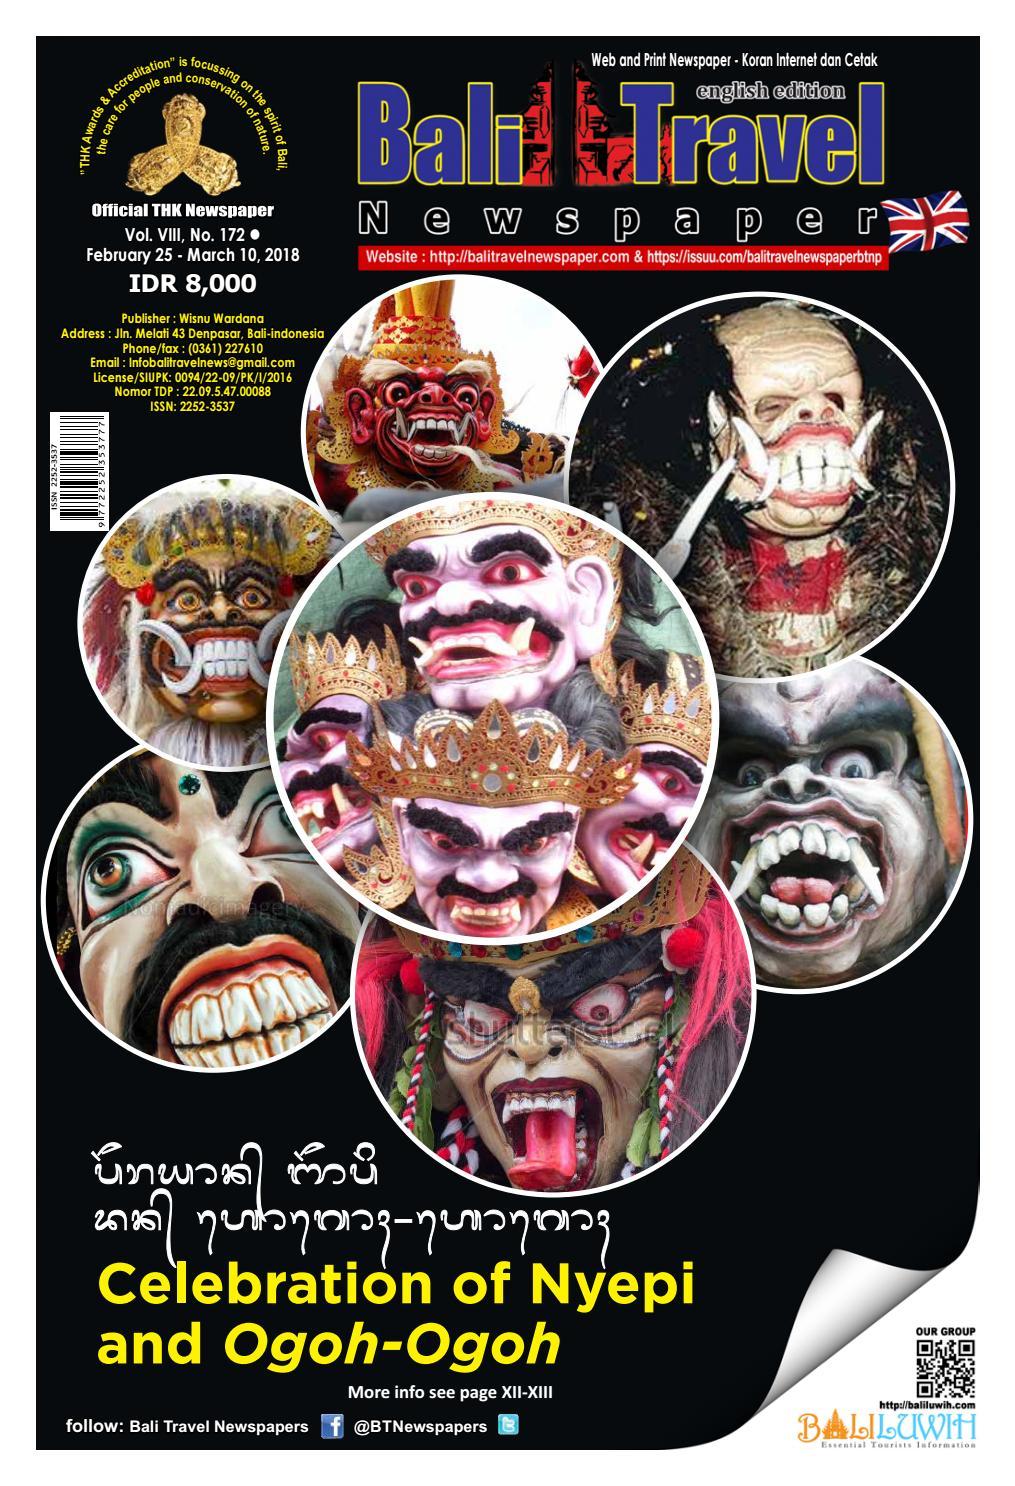 Bali Travel Newspaper Edisi 172 By Balitravelnewspaper Btnp Issuu Produk Ukm Bumn Bag Small Size